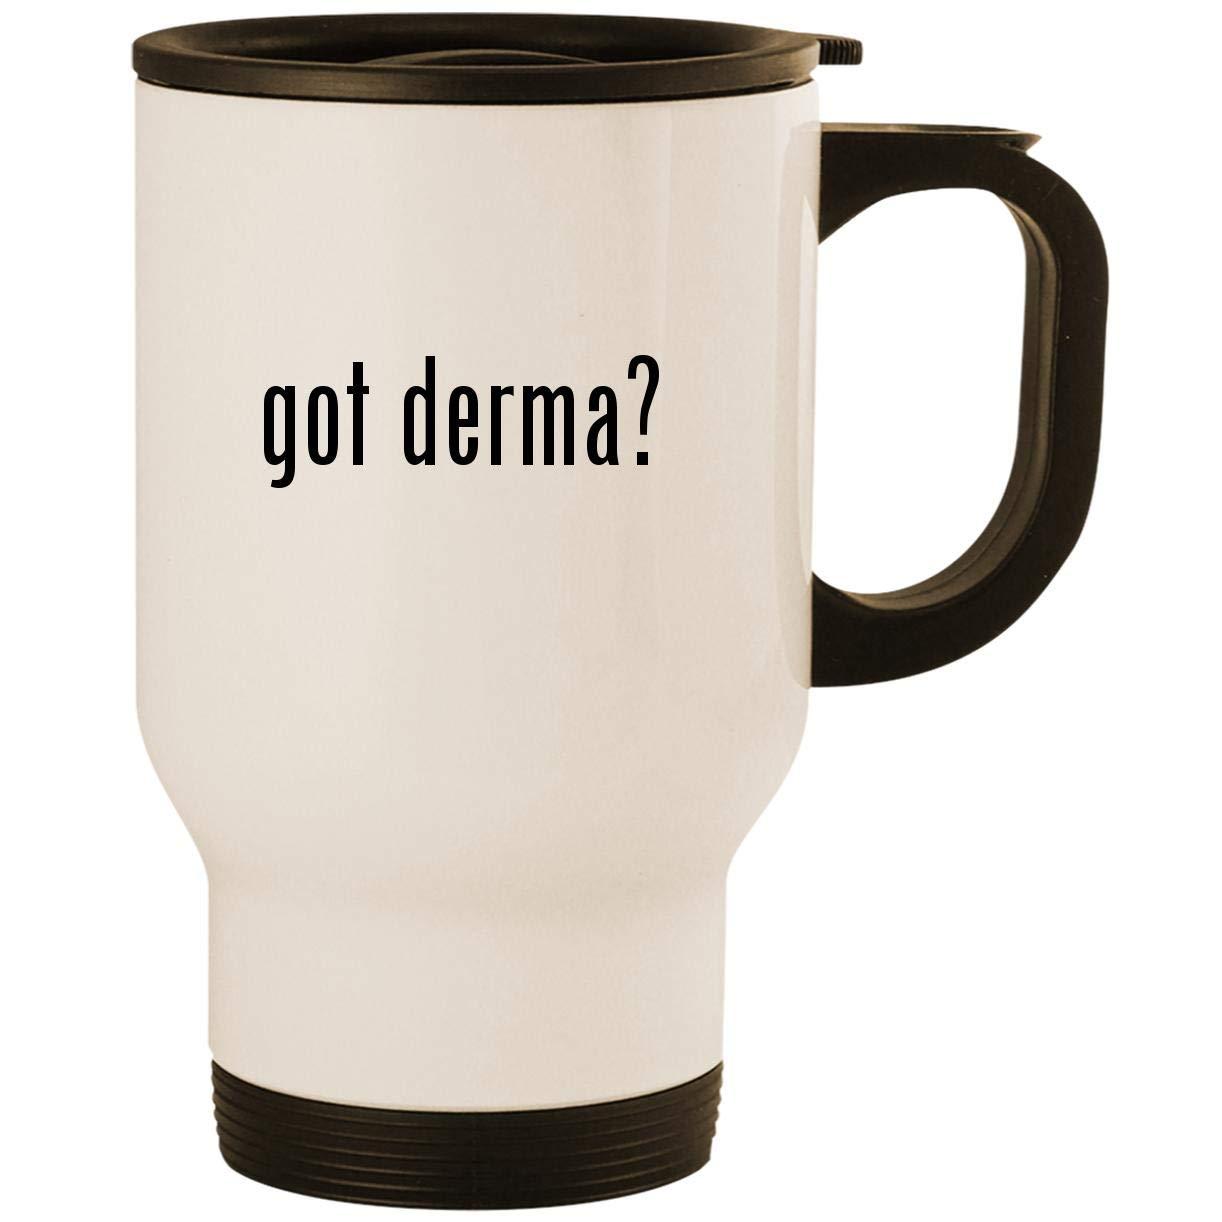 got derma? - Stainless Steel 14oz Road Ready Travel Mug, White